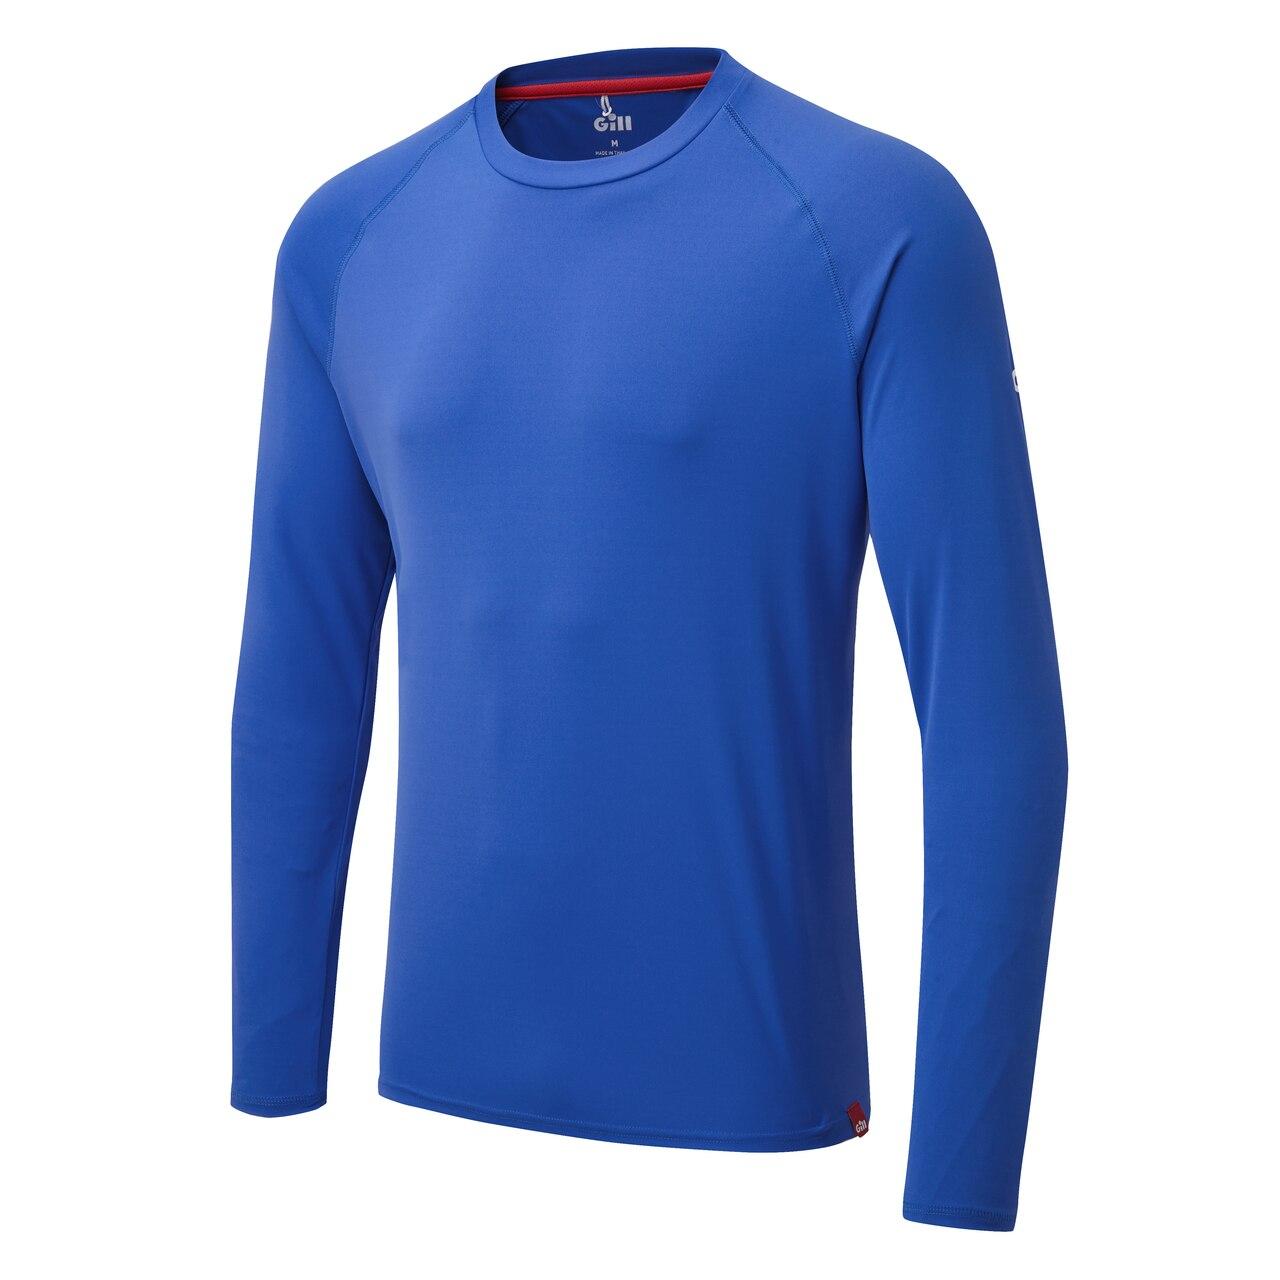 Men's UV Tec Long Sleeve Tee - UV011-BLU01-2.jpg